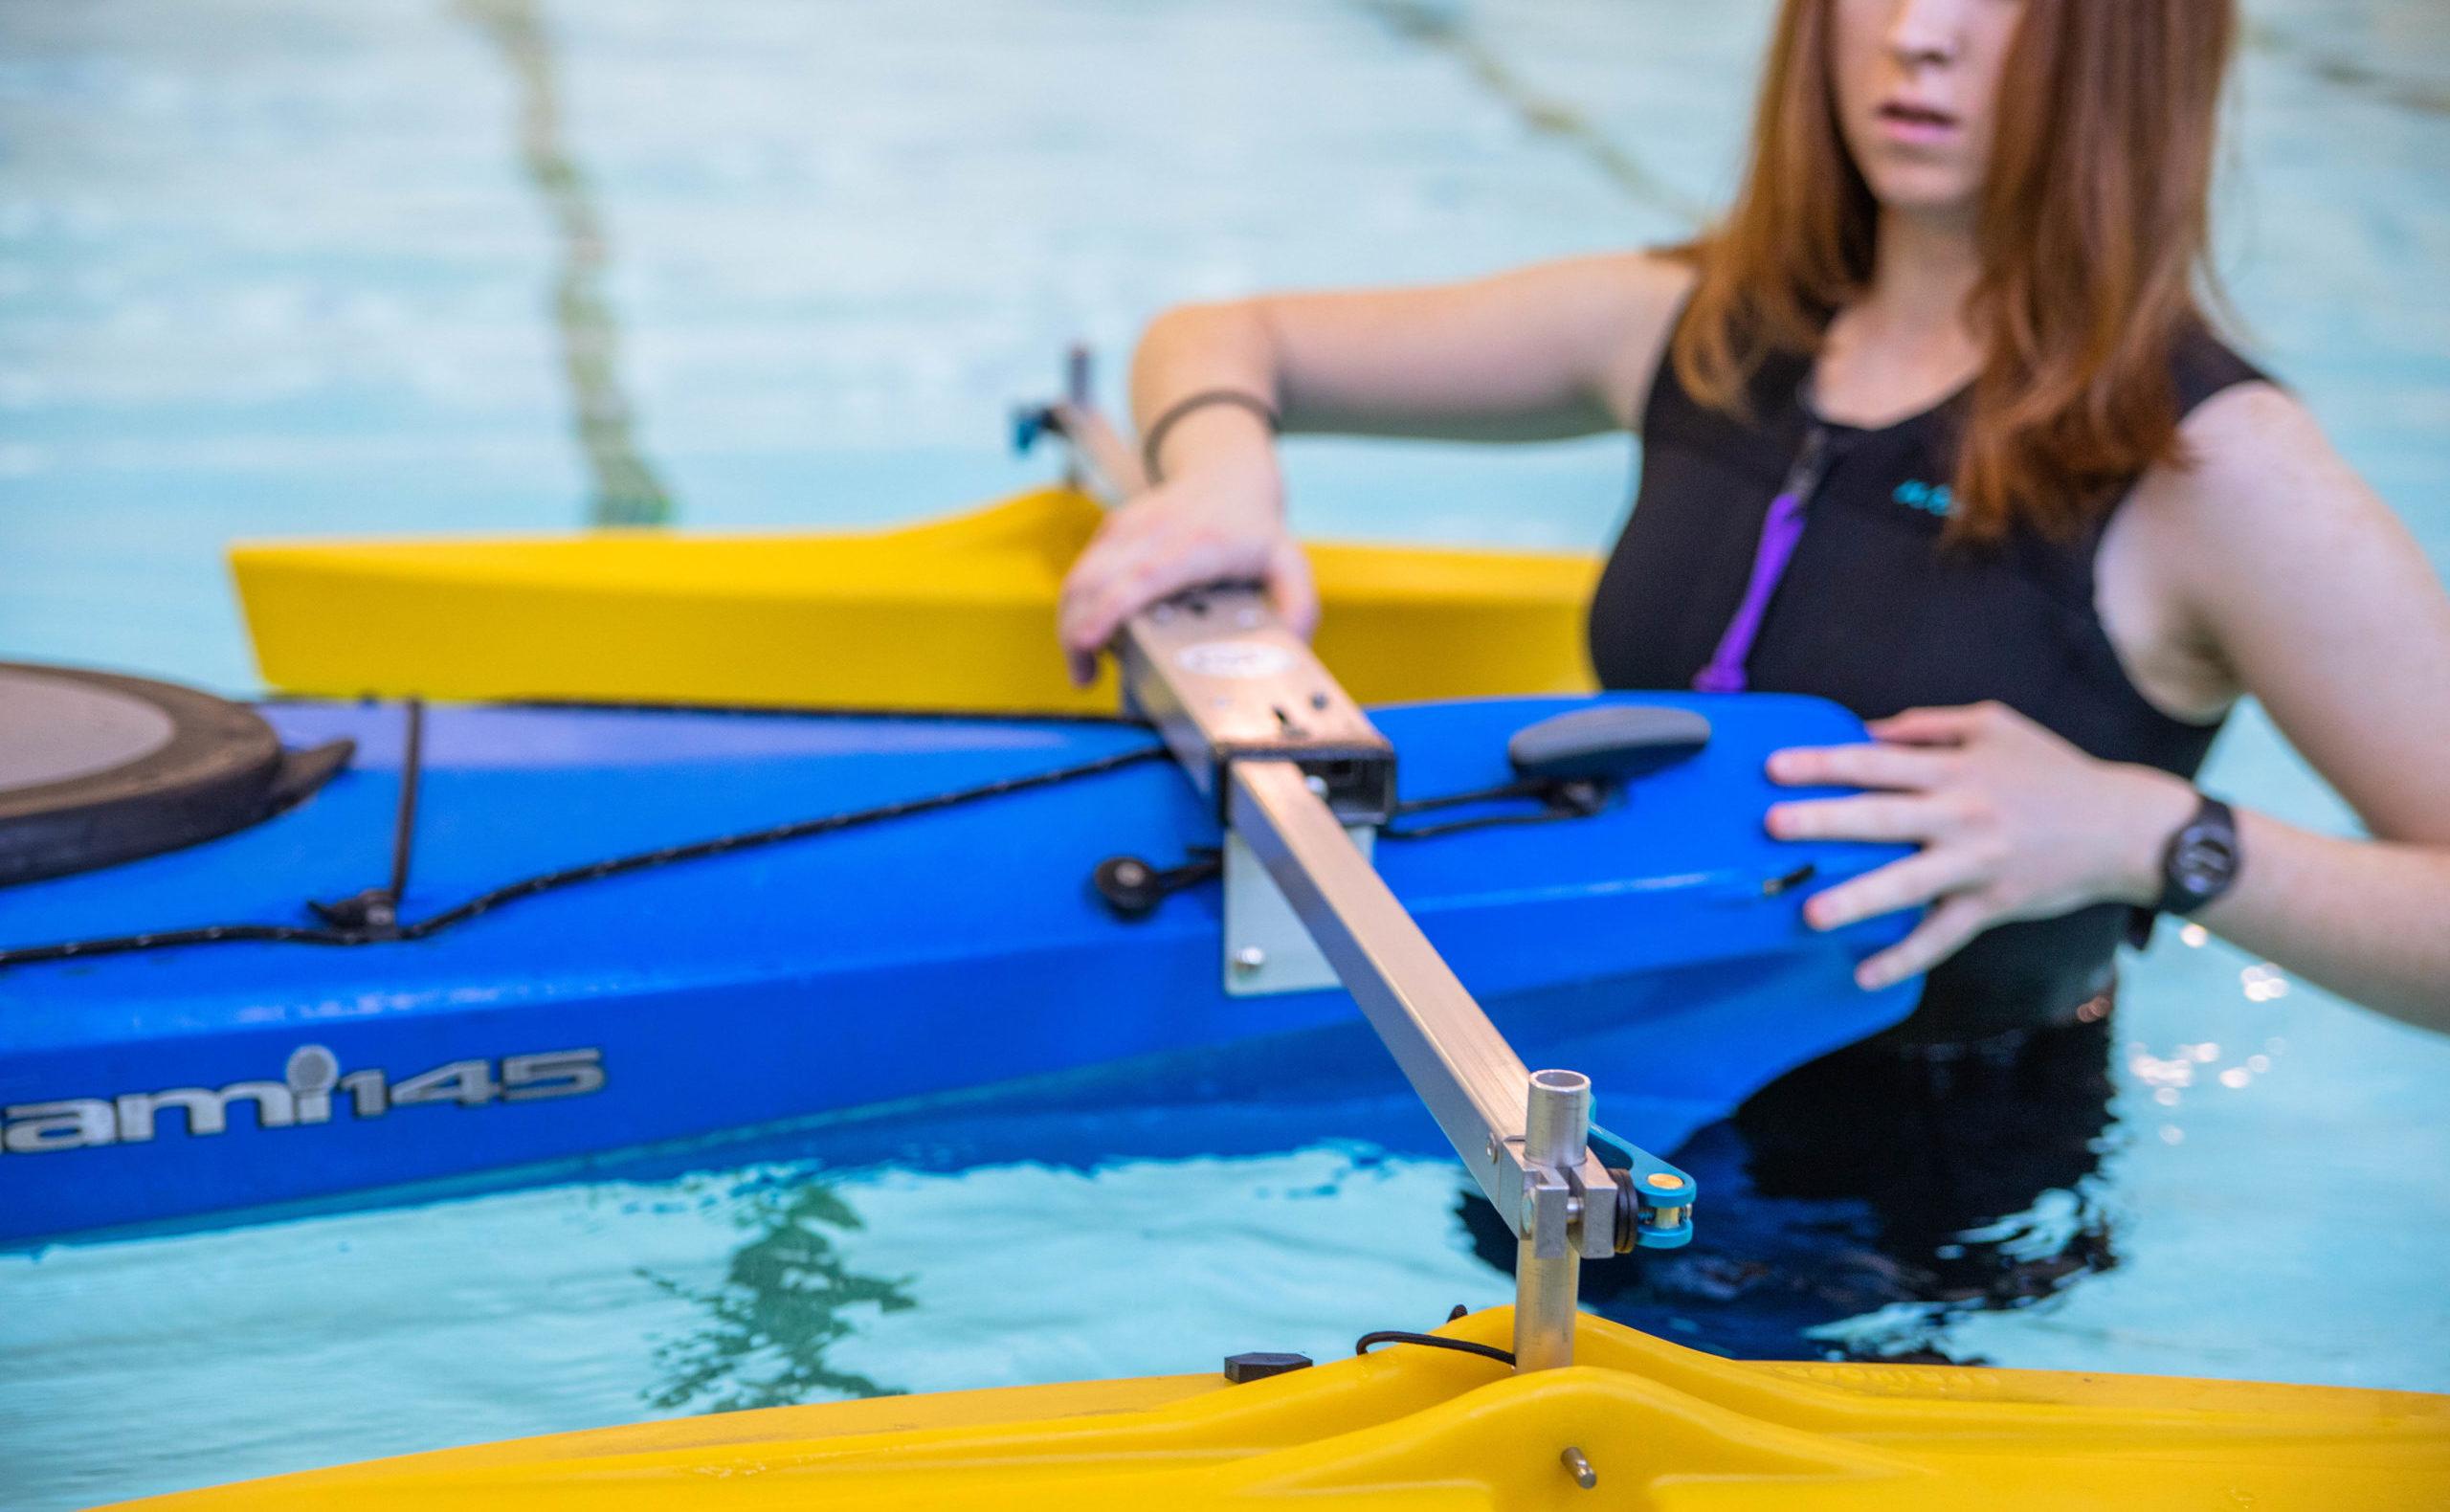 Photo: Woman holding kayak in pool